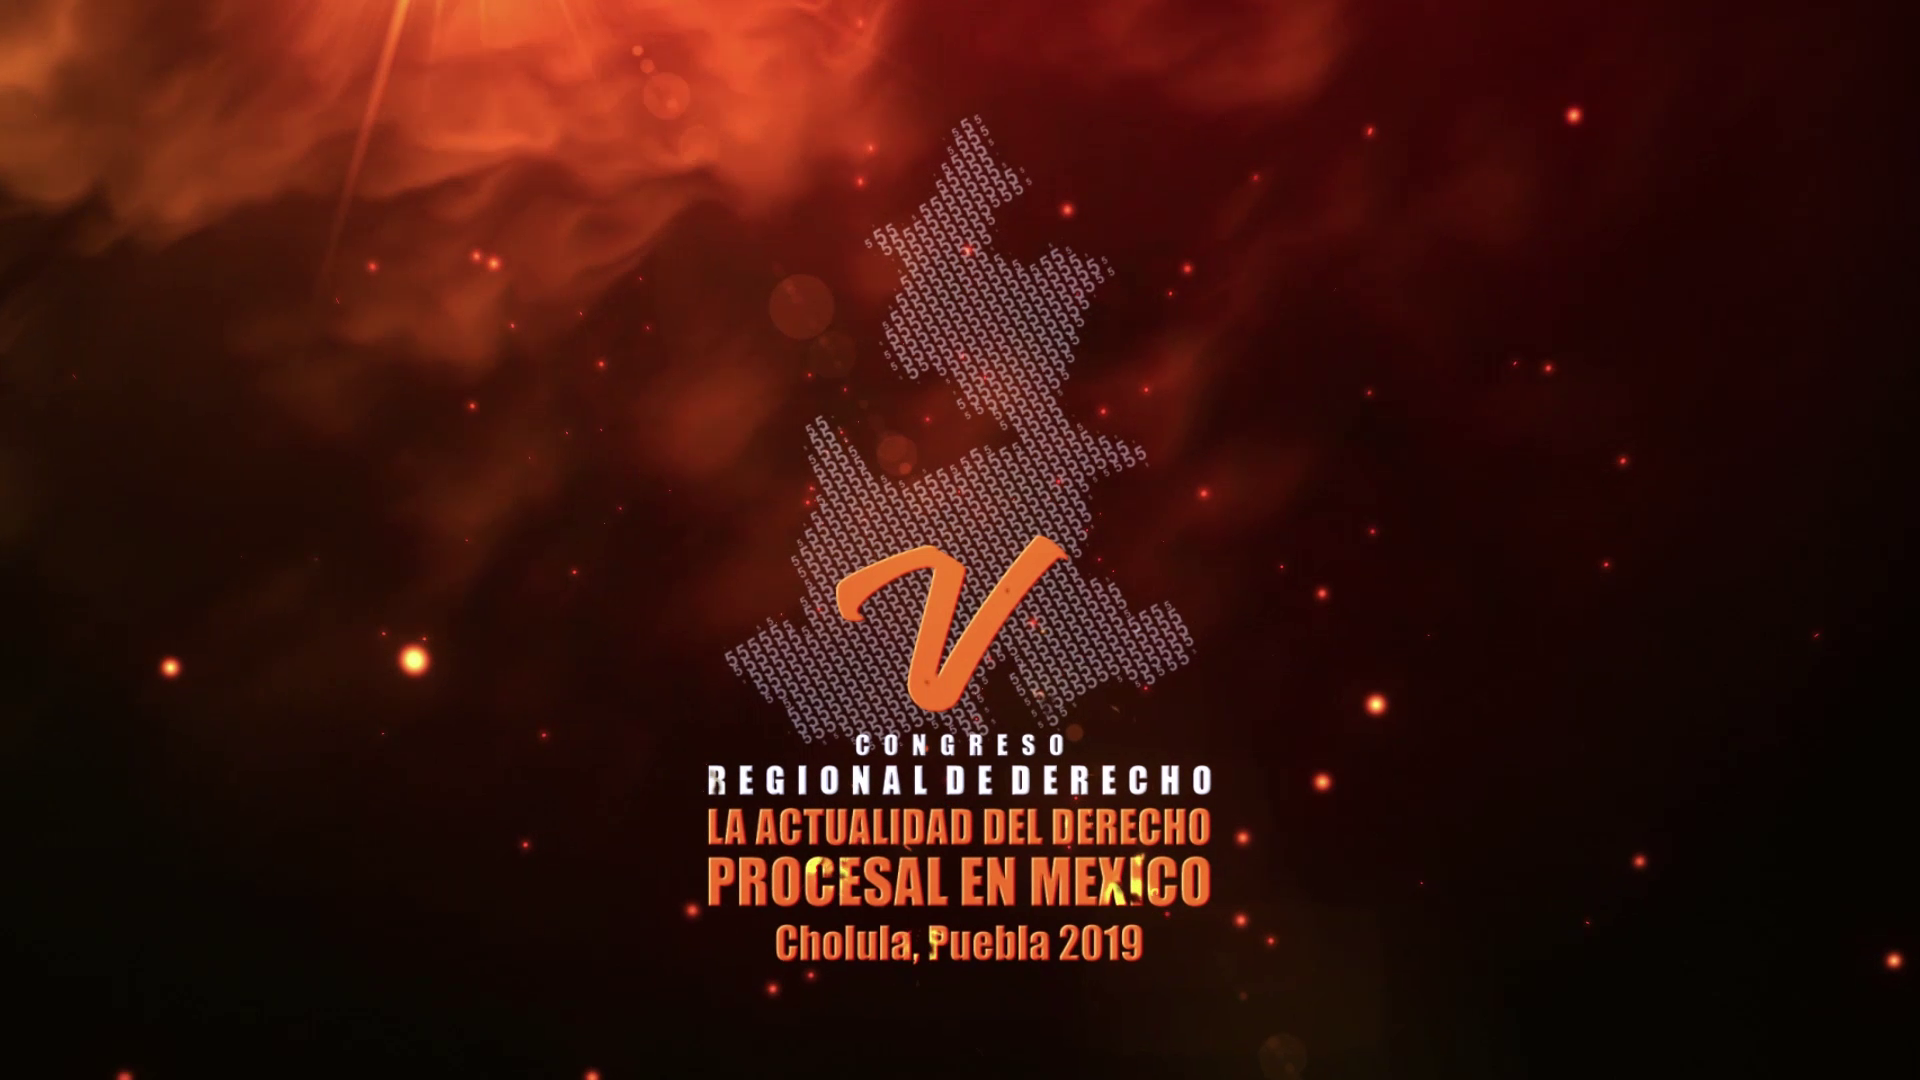 V Congreso Regional Espasa Instituto